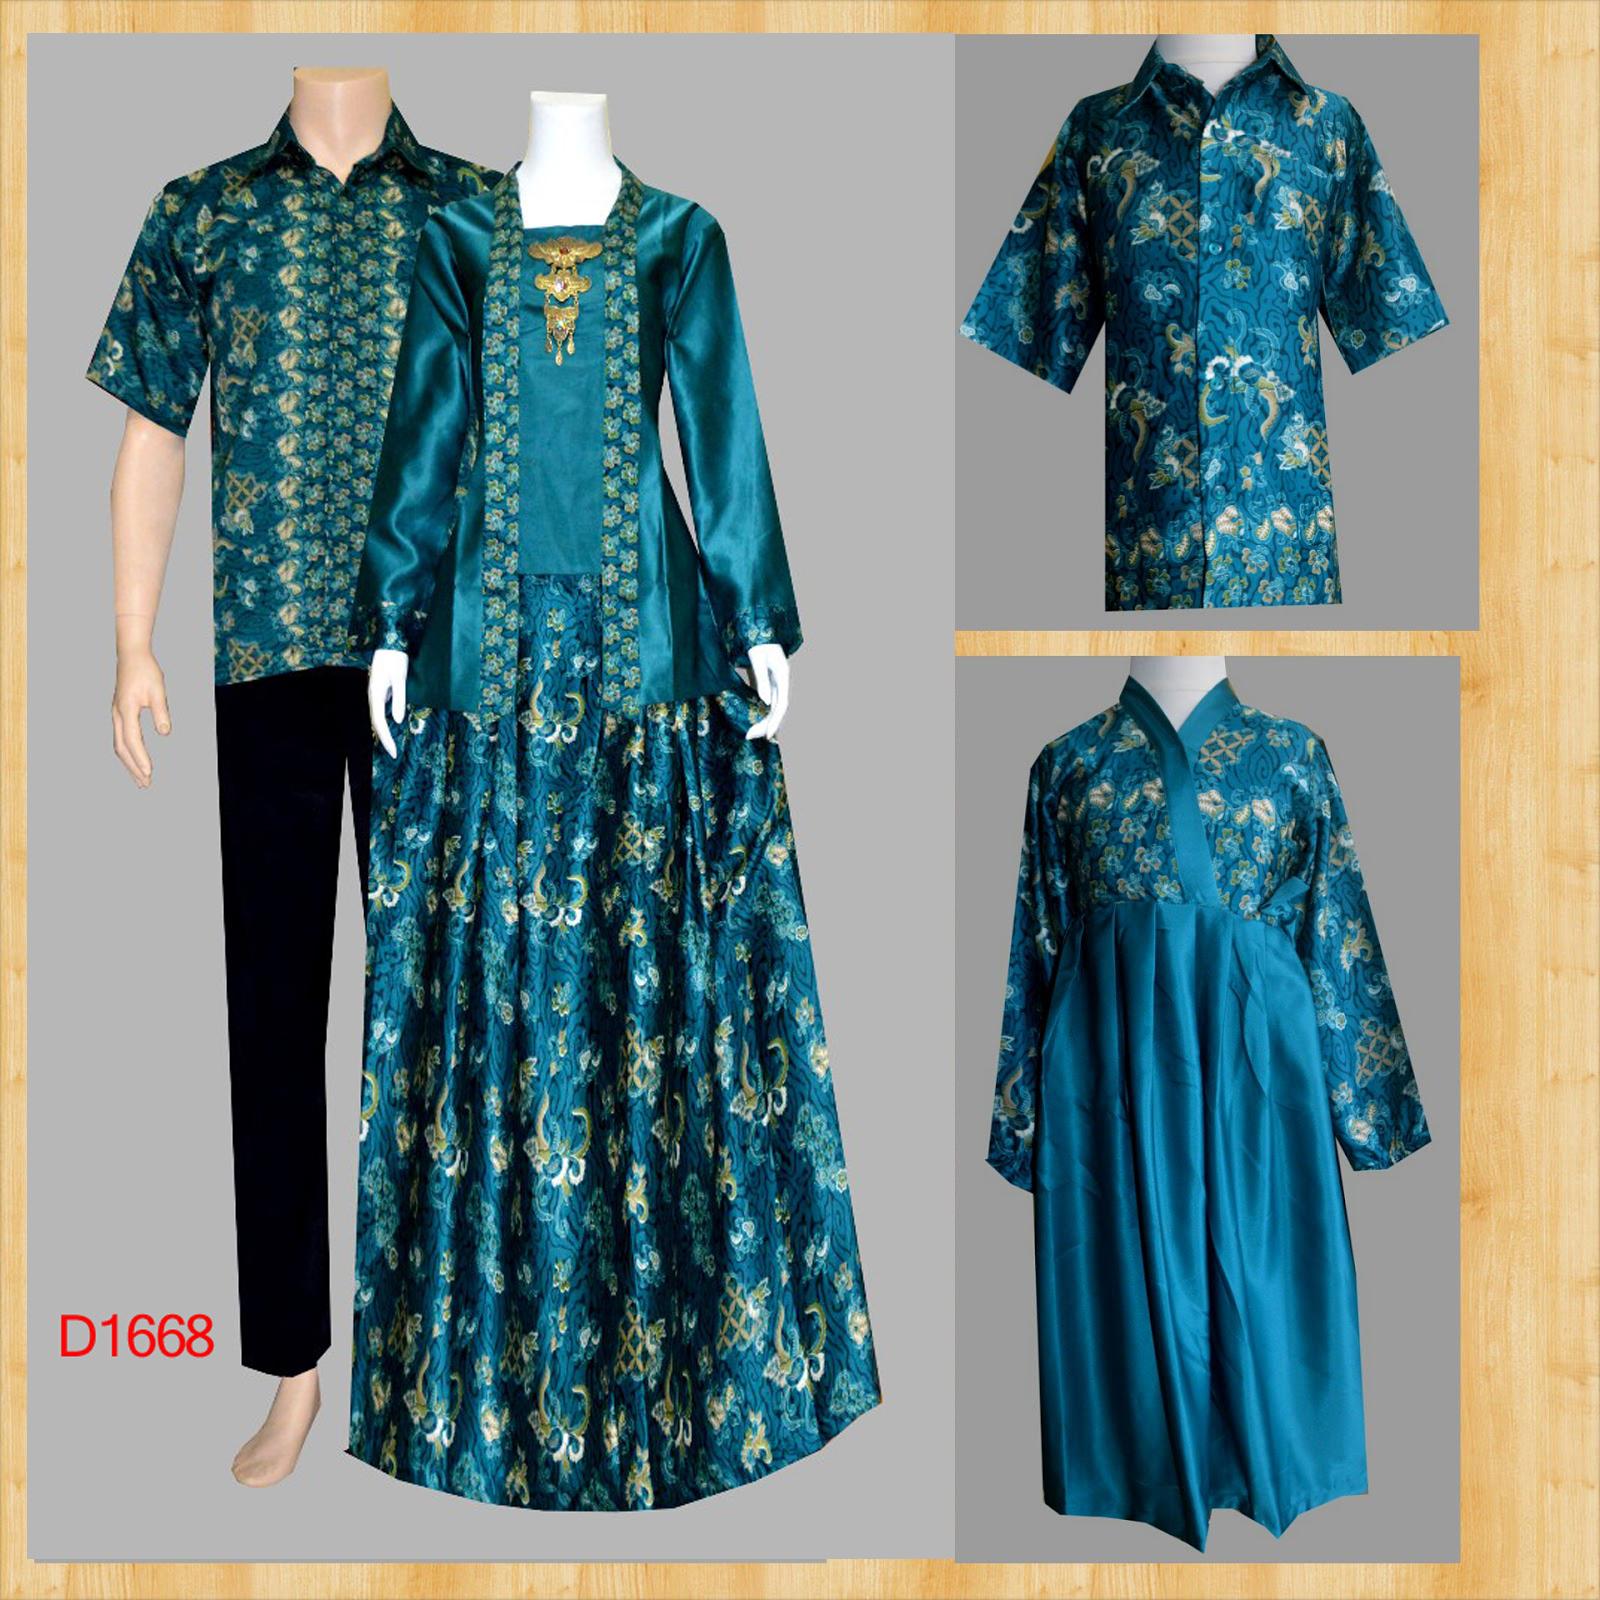 Model Baju Batik Kerja Kombinasi Kain Polos Ulasan Produk Terlaris